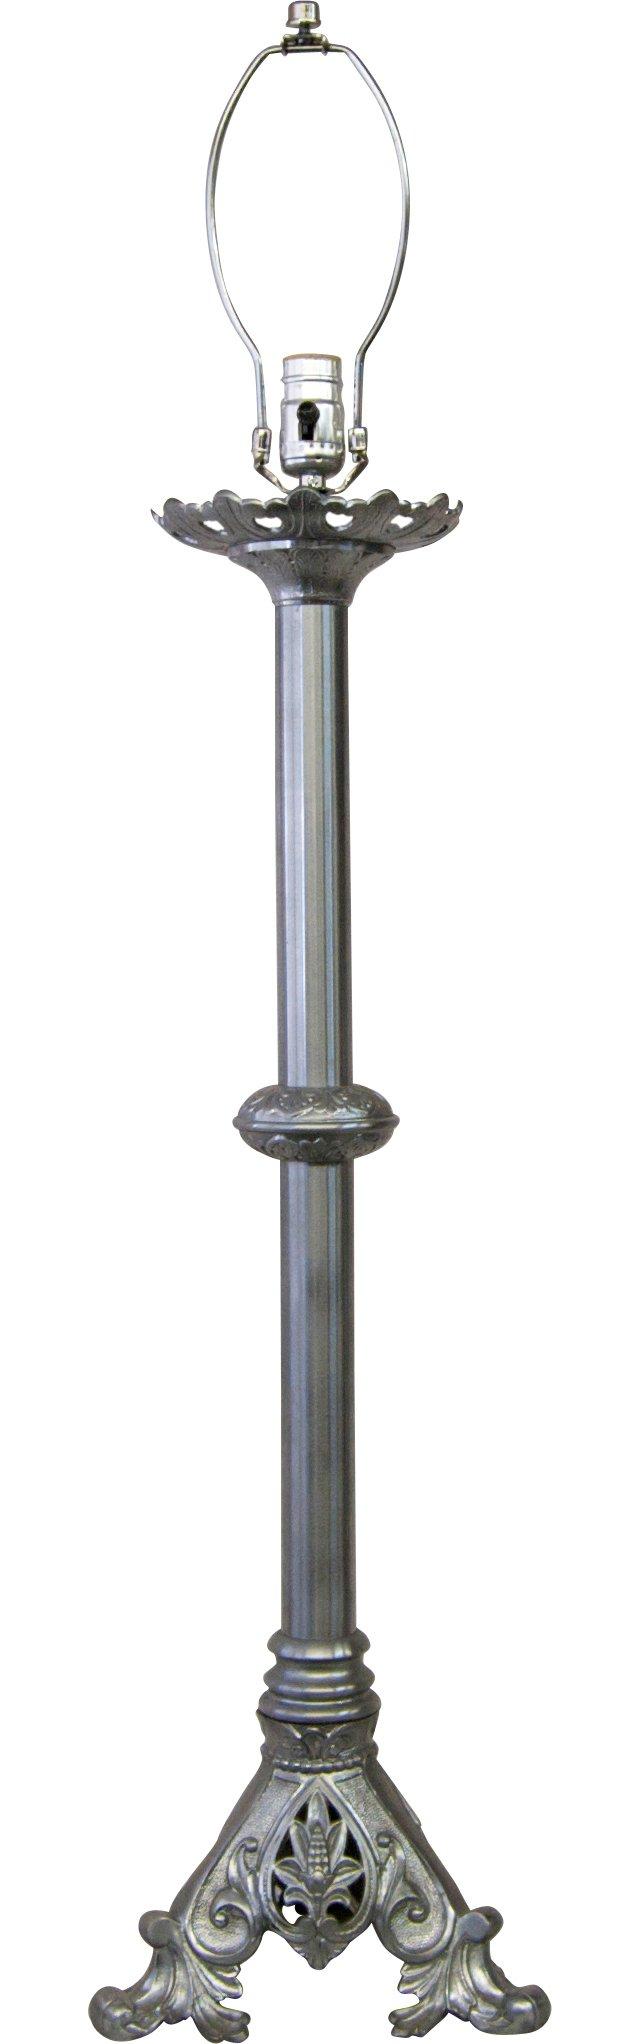 Nickel Candlestick Lamp